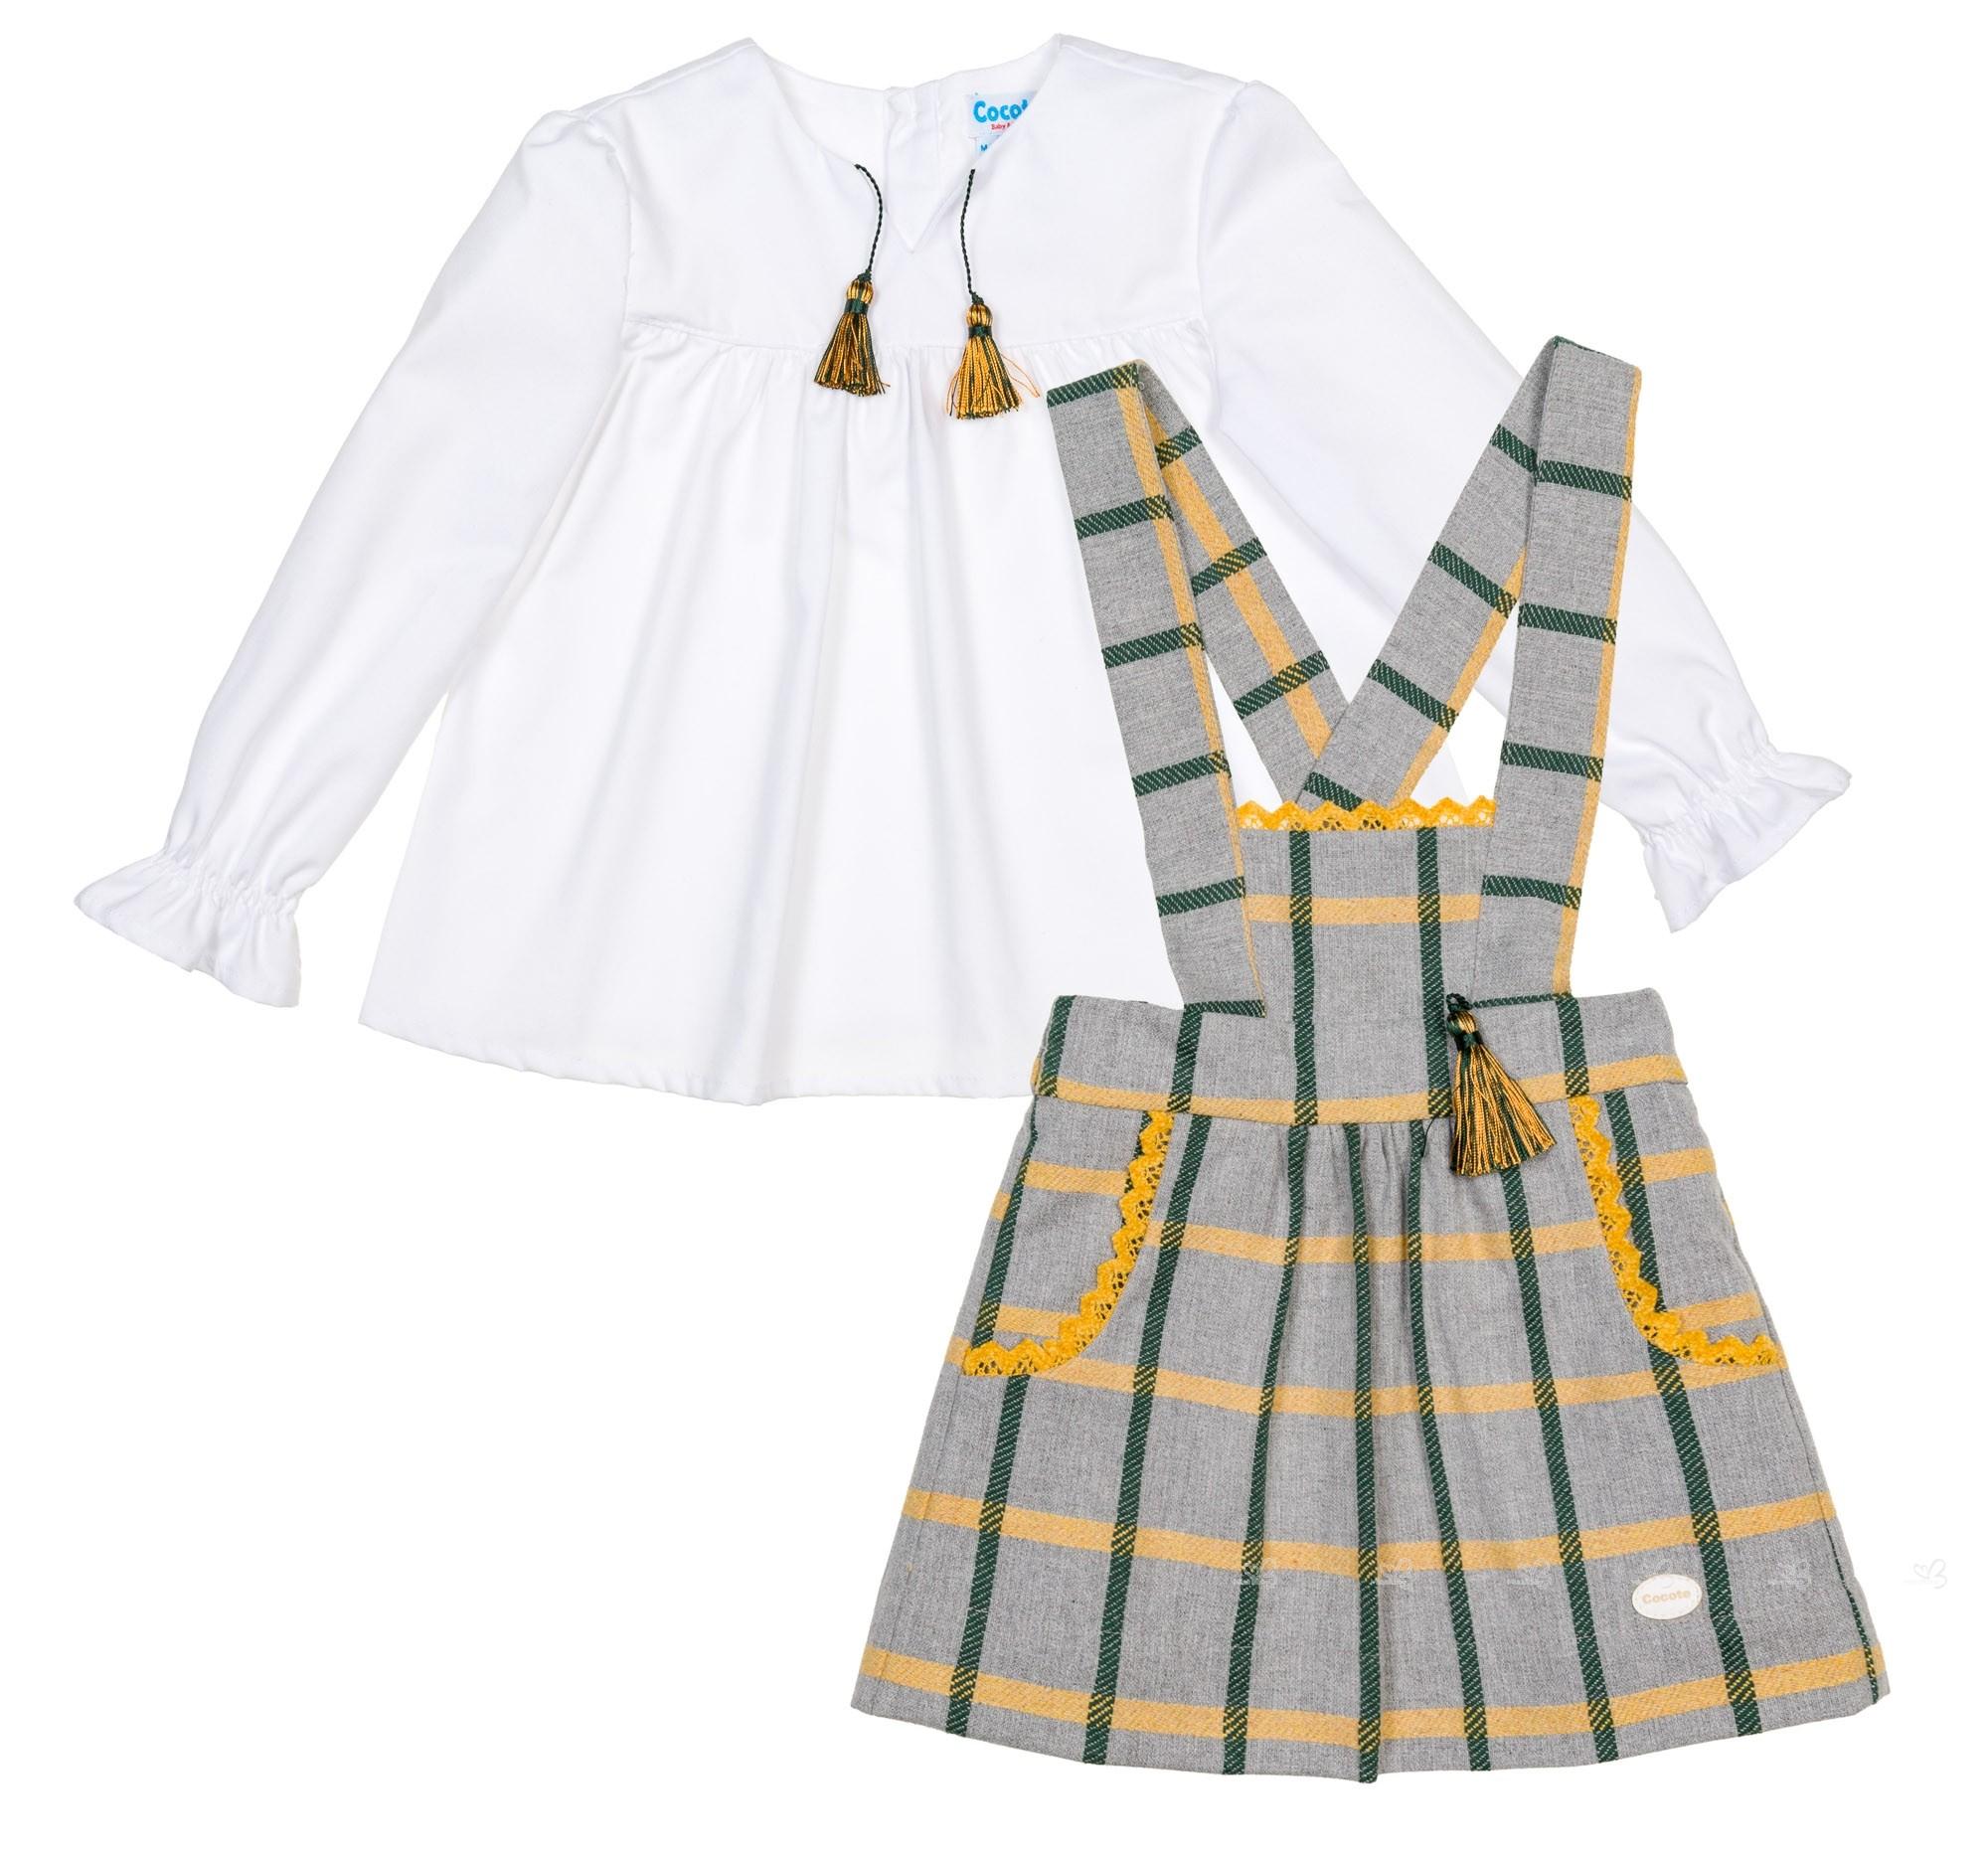 muy agradable características sobresalientes estilo de moda de 2019 Conjunto Niña Blusa Blanca & Falda Peto Cuadros Gris